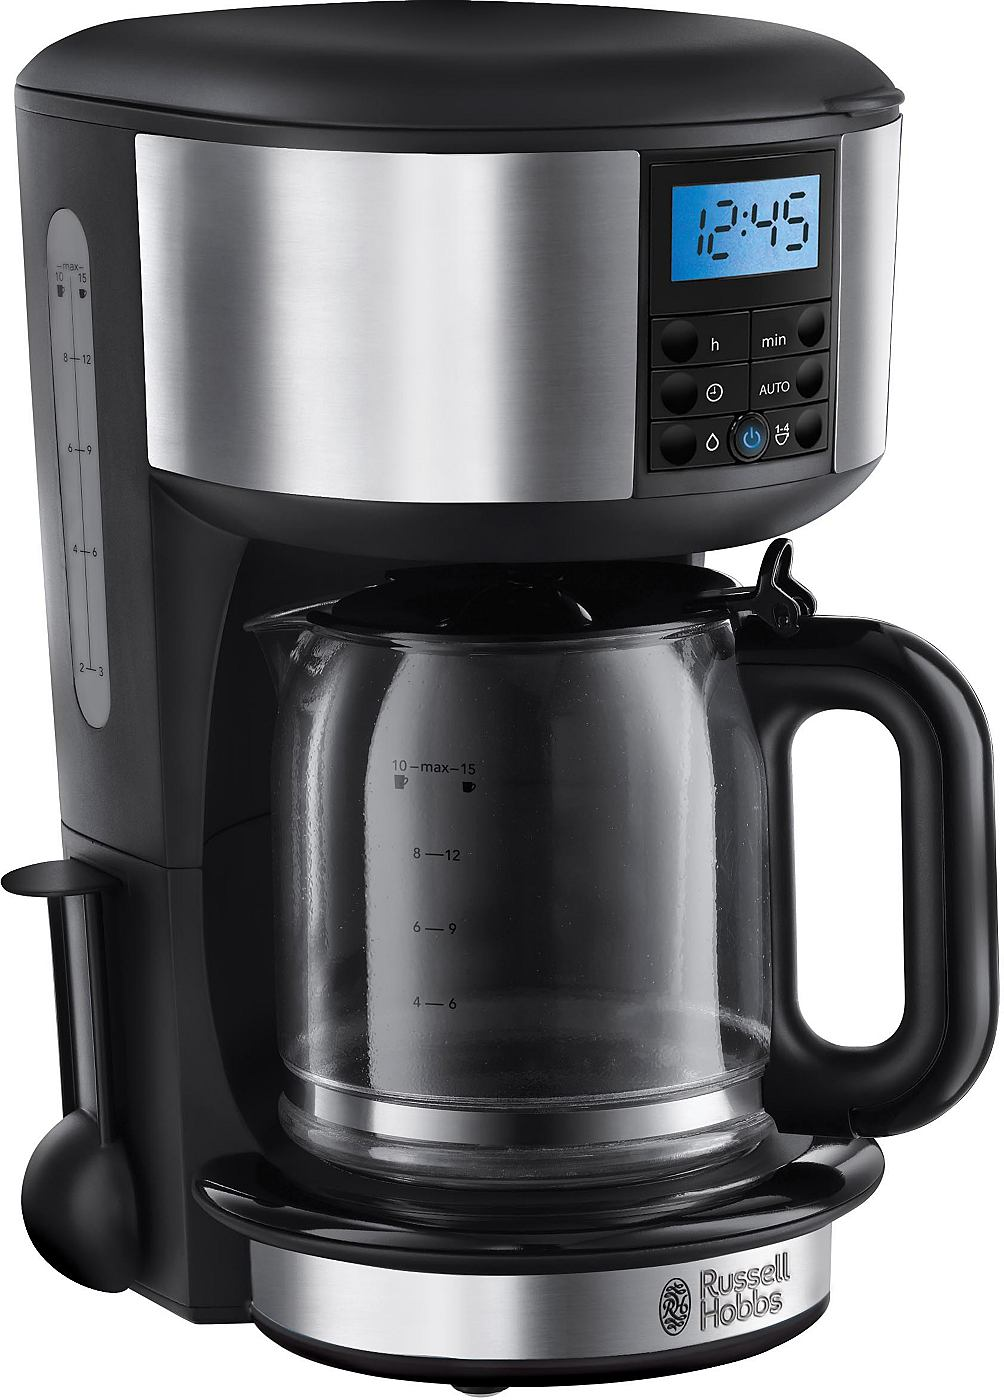 Russell Hobbs Glas-Kaffeemaschine 20681-56